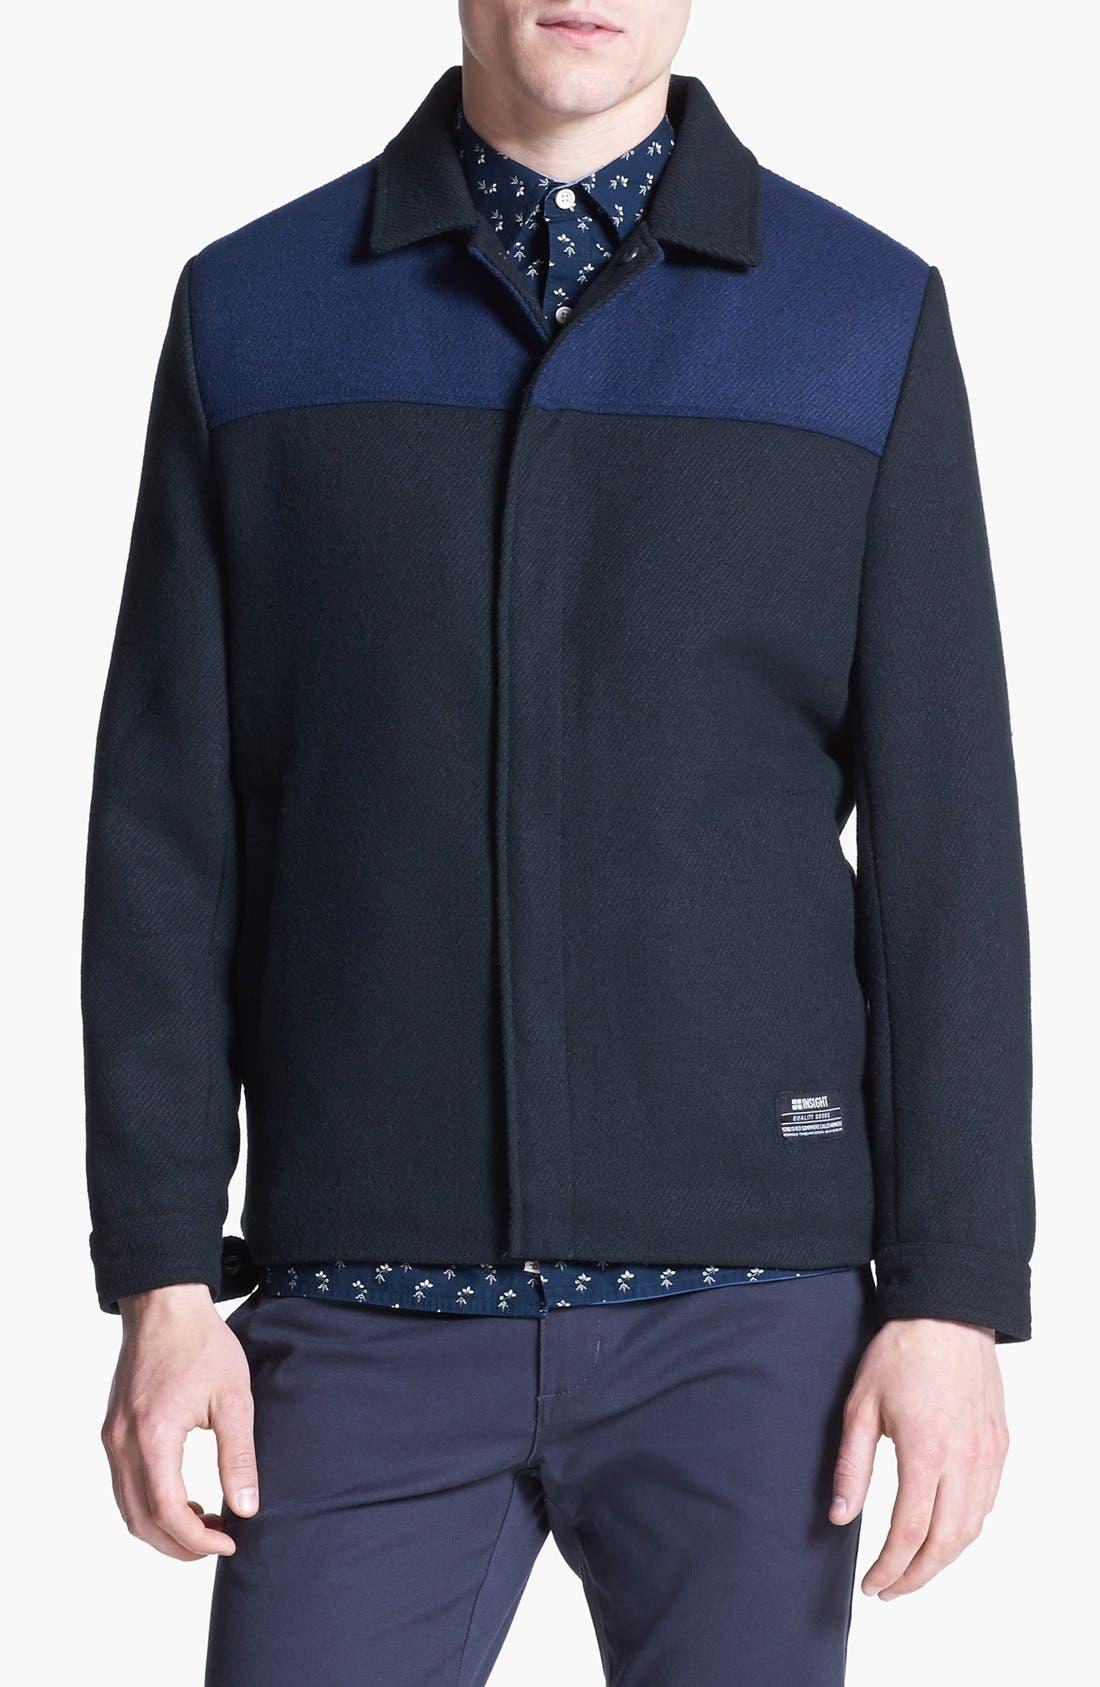 Alternate Image 1 Selected - Insight 'Blazin' Knit Jacket